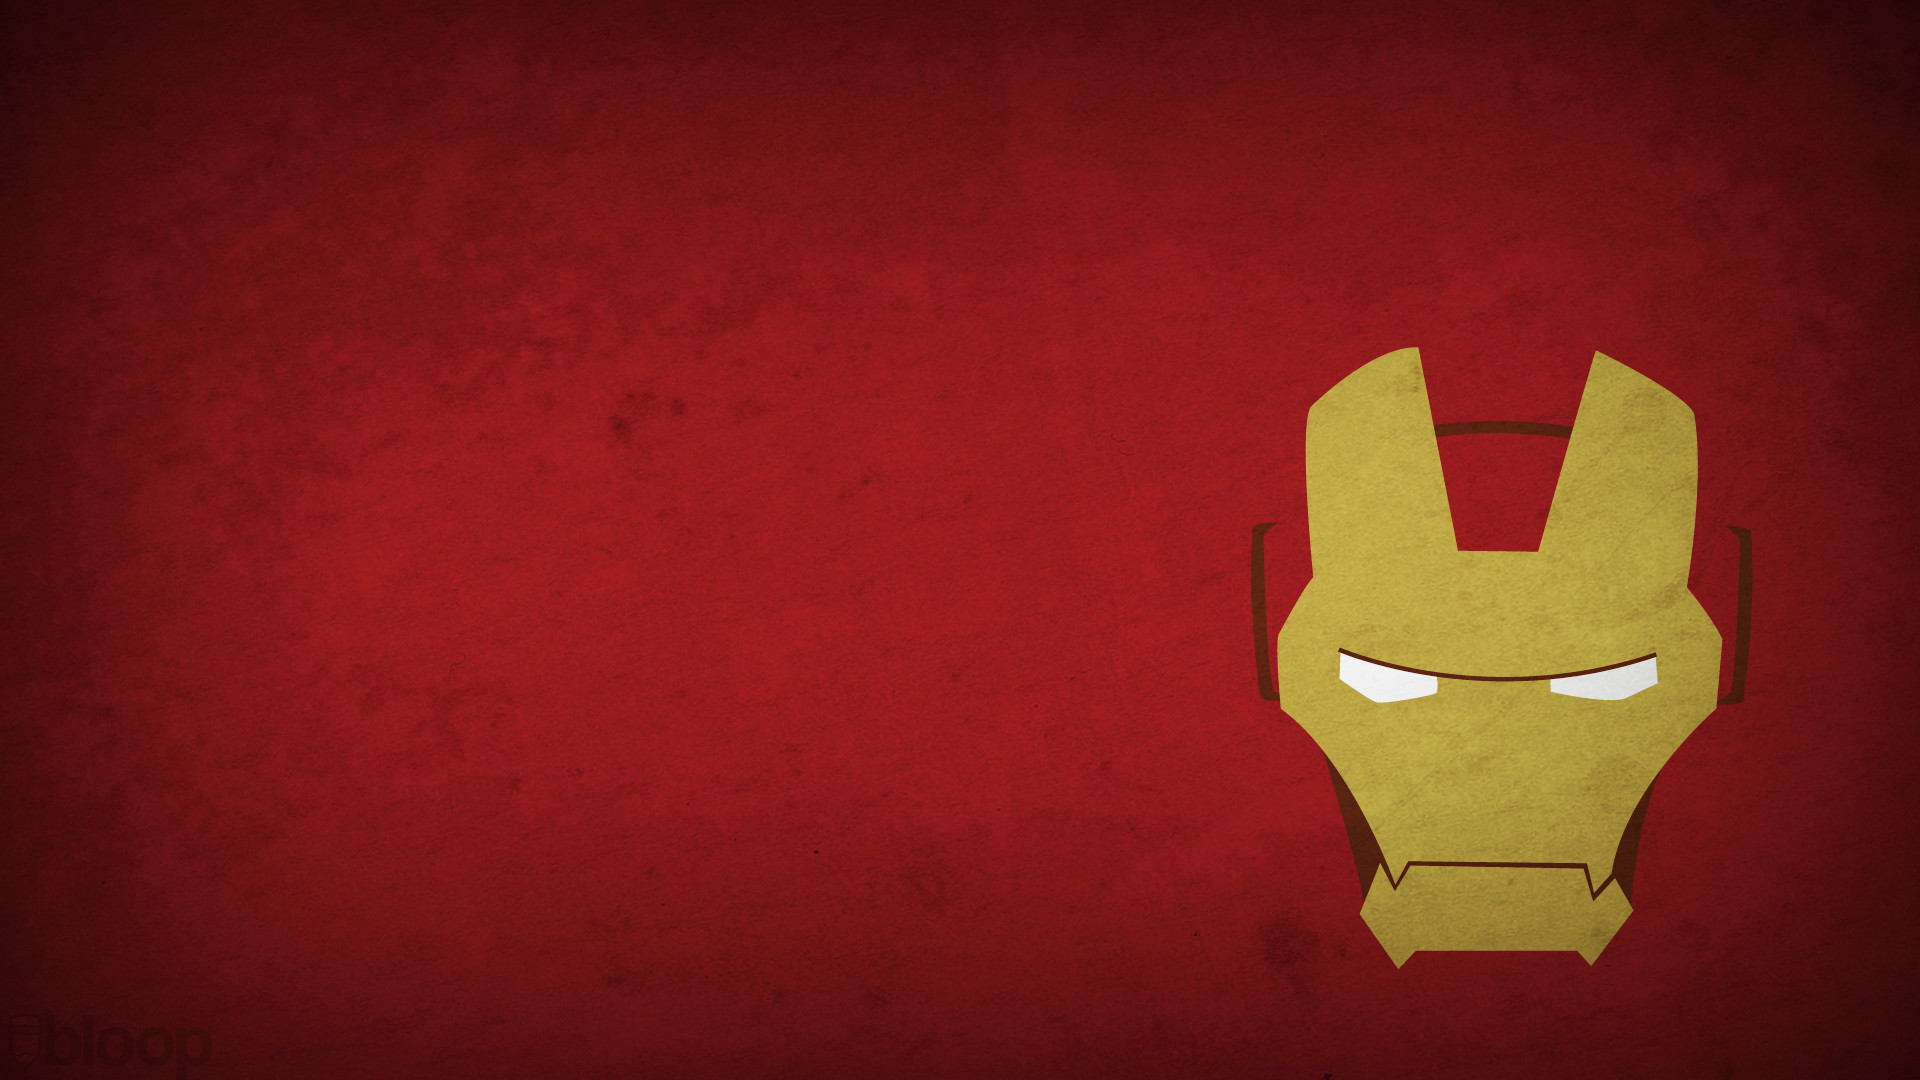 Superheroes – Minimalistic Hi-Res Wallpapers